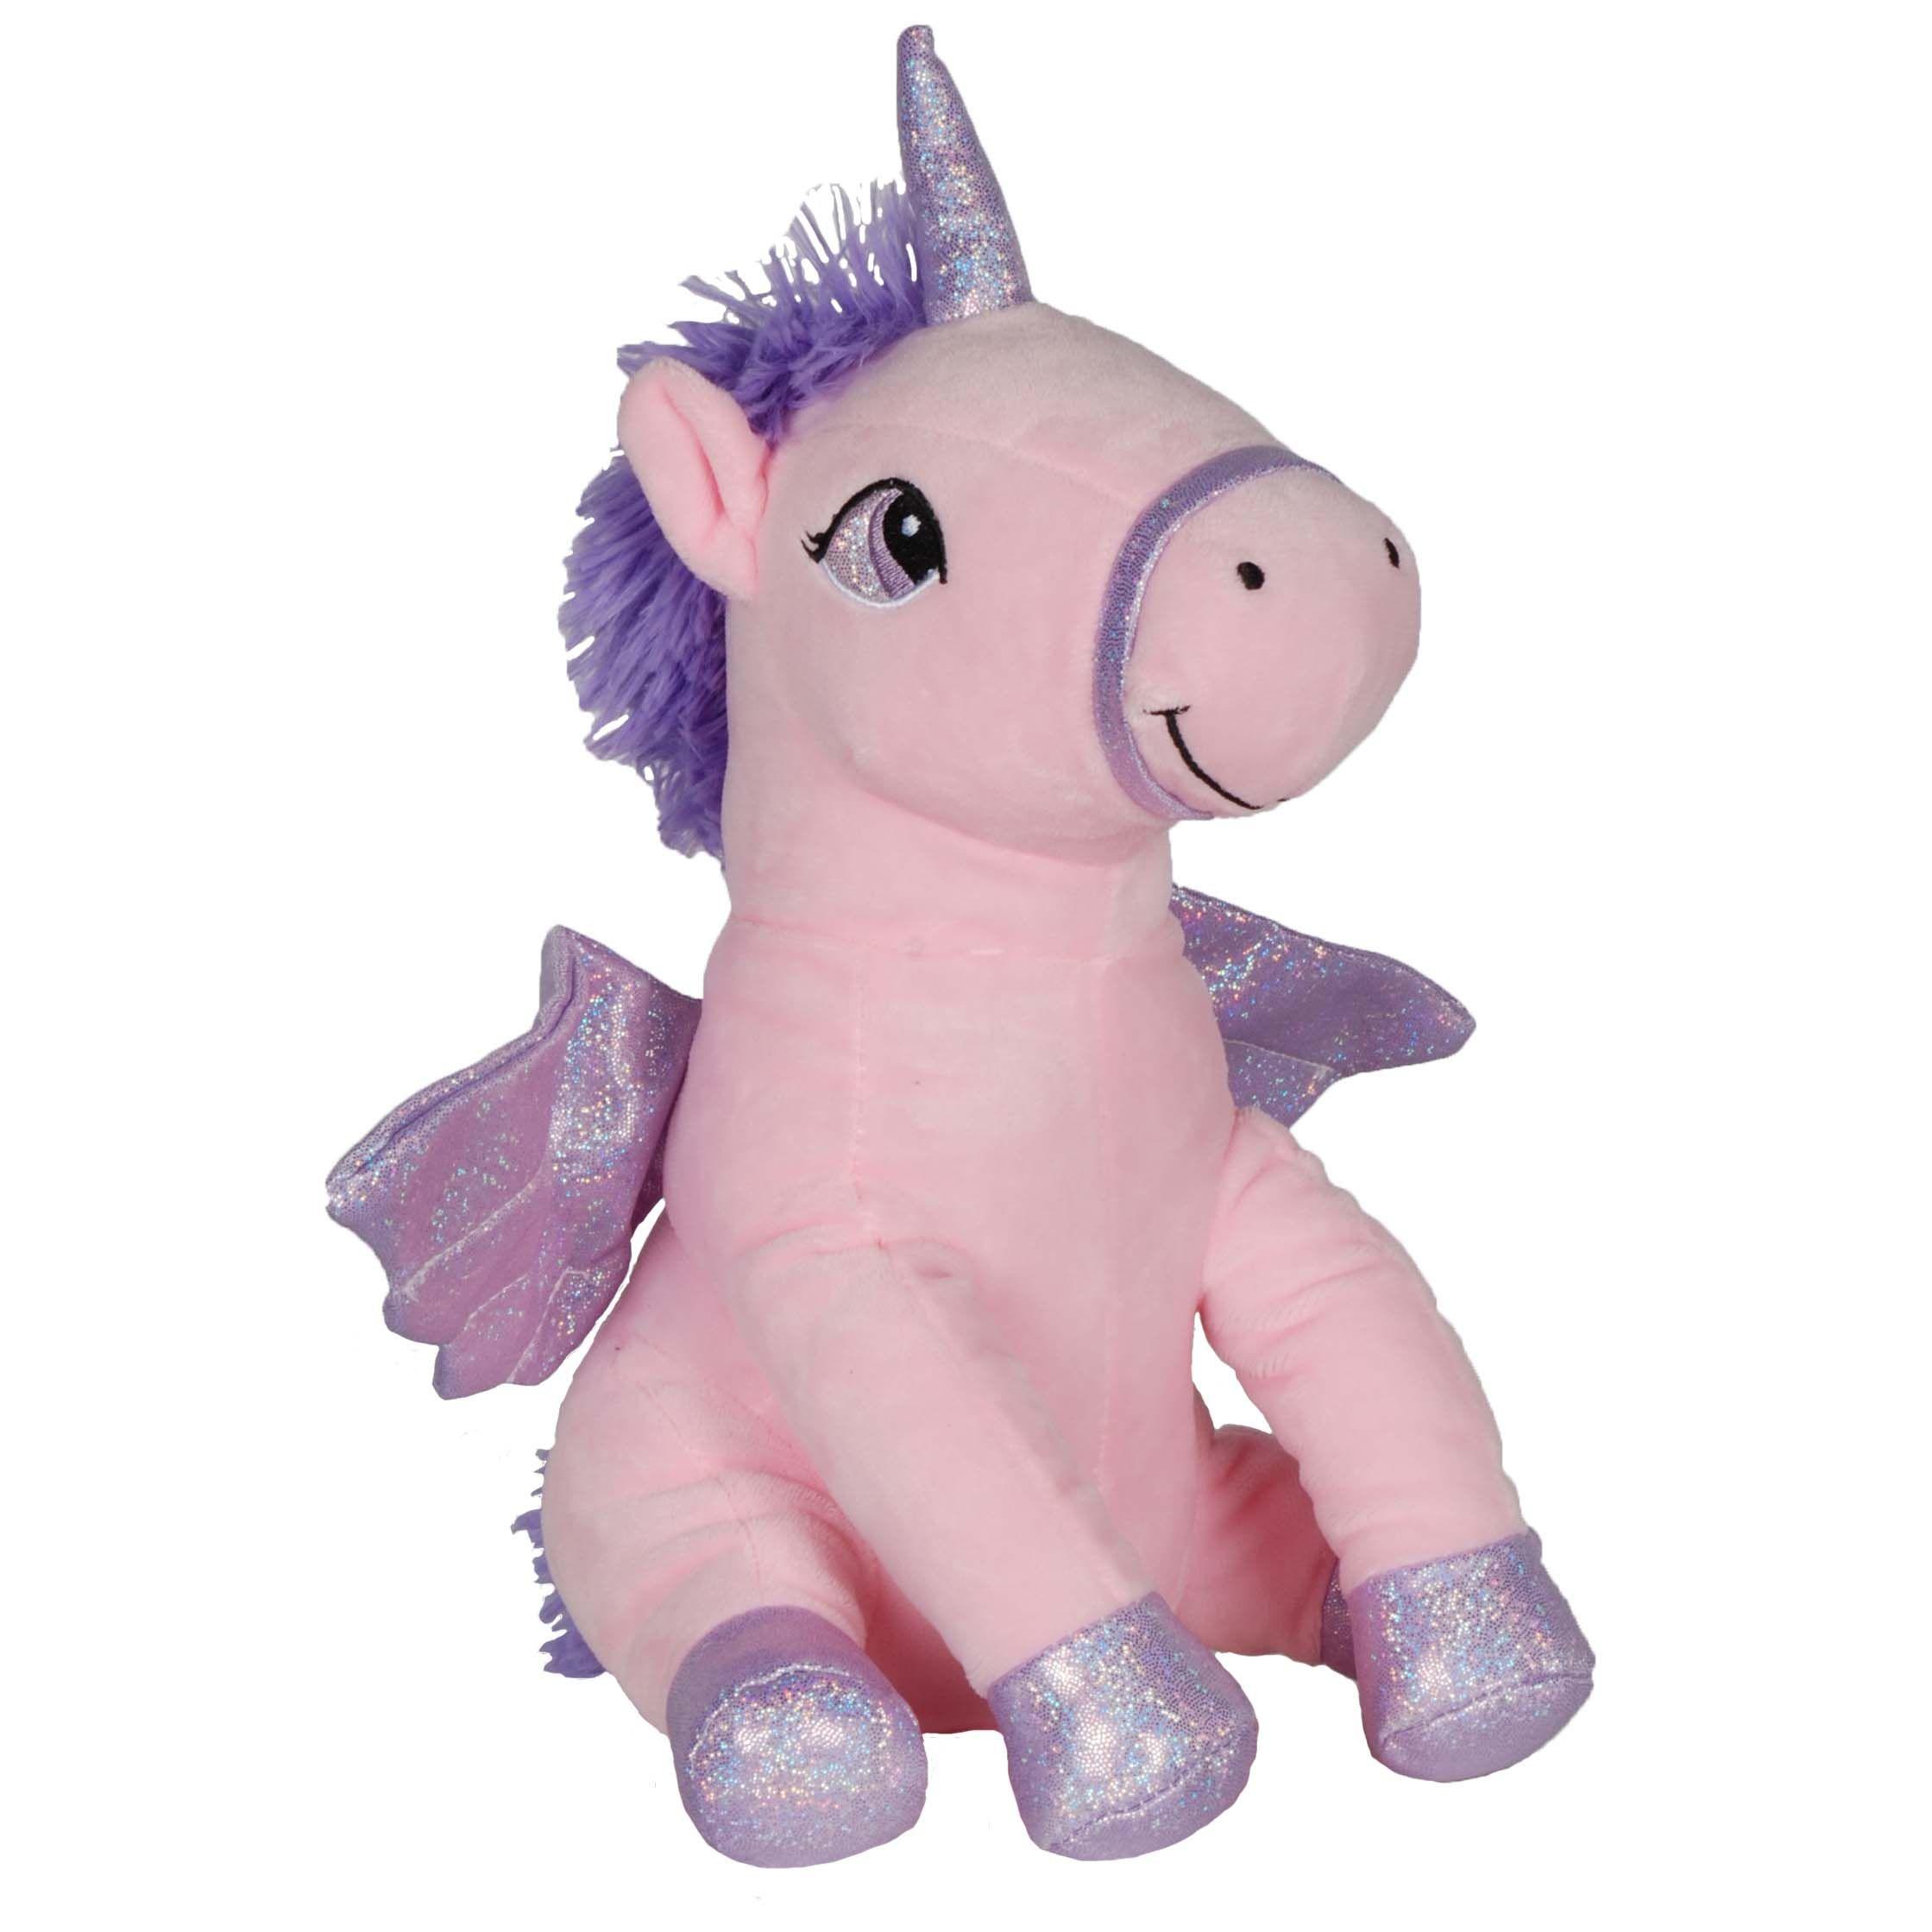 Knuffel Maggie the Unicorn roze